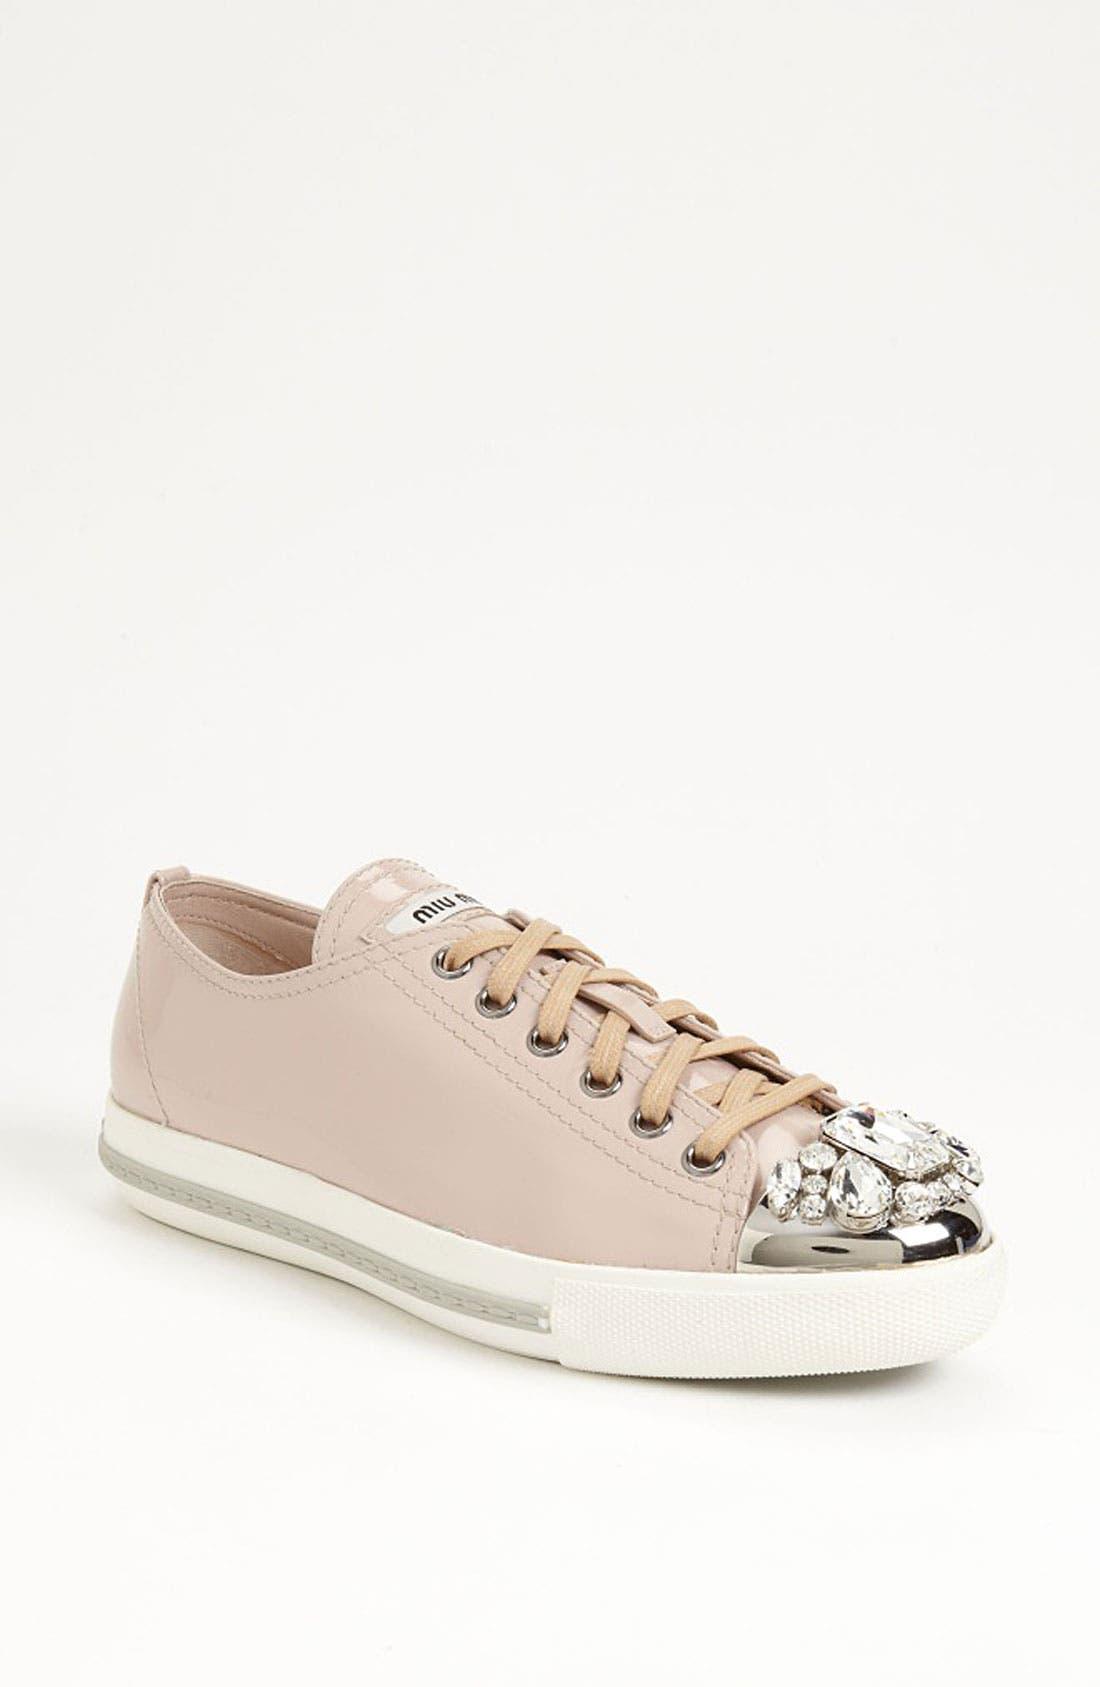 Alternate Image 1 Selected - Miu Miu Crystal Cap Toe Sneaker